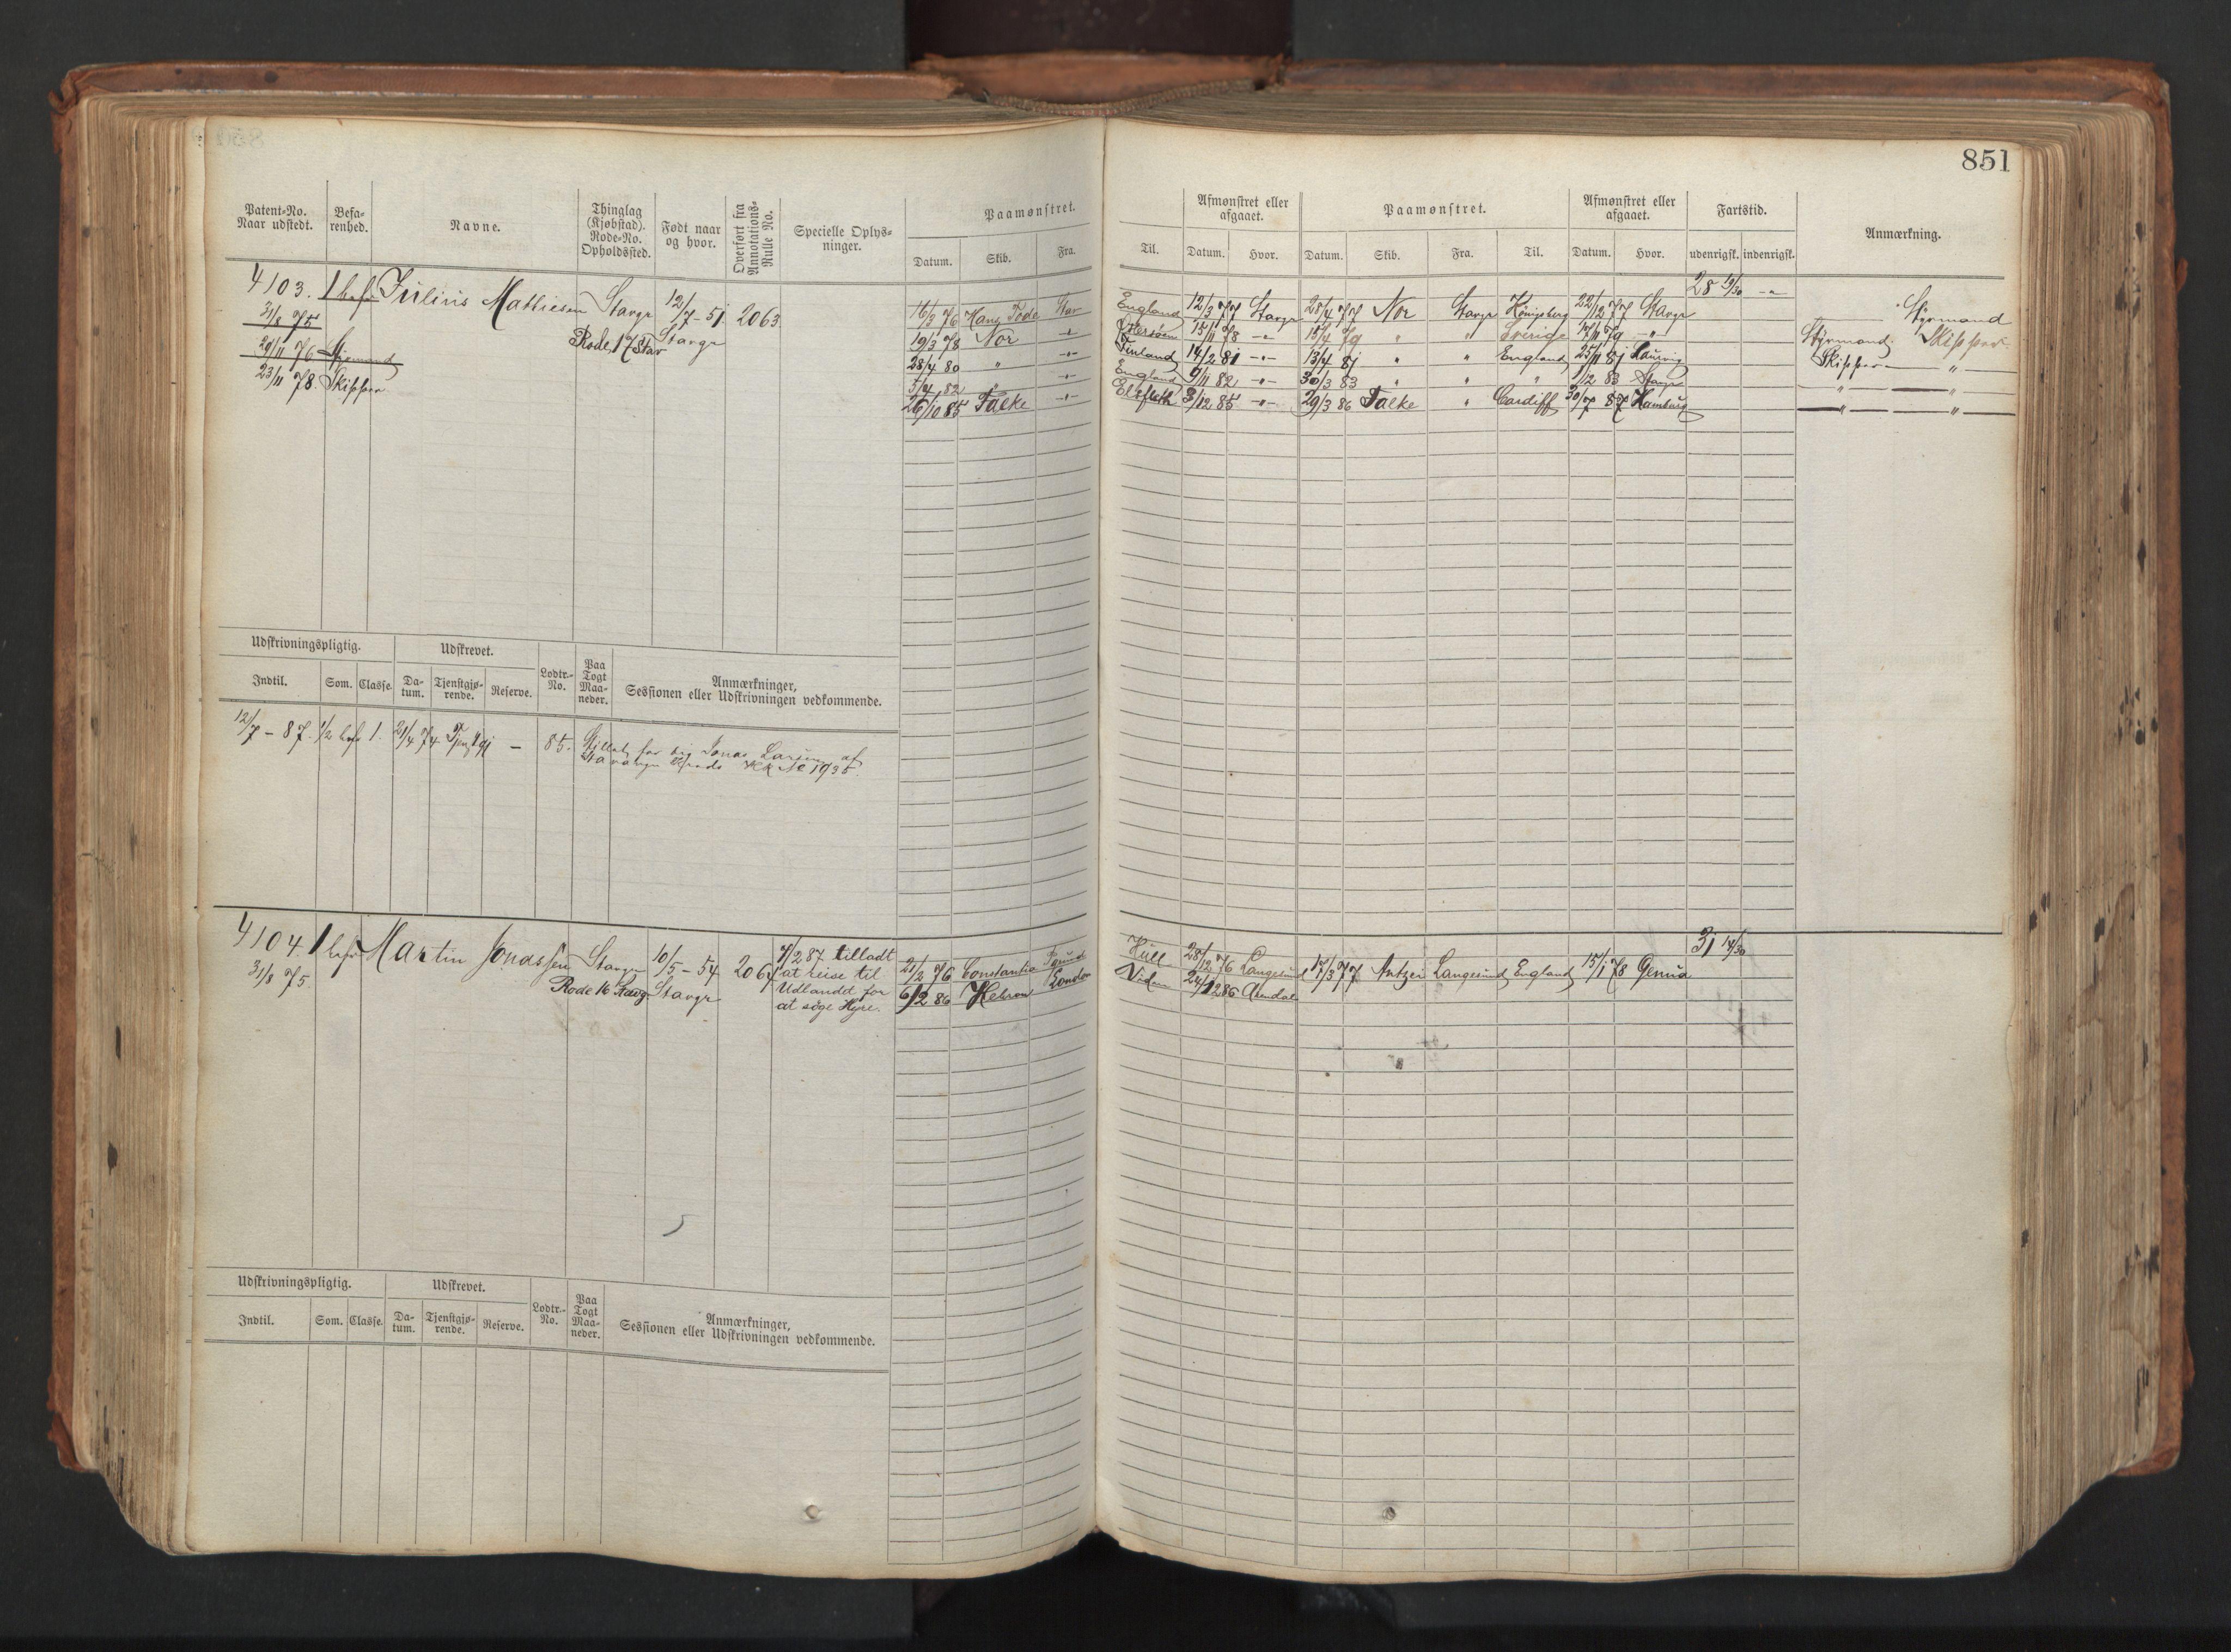 SAST, Stavanger sjømannskontor, F/Fb/Fbb/L0008: Sjøfartshovedrulle, patentnr. 3605-4804, 1873, p. 292